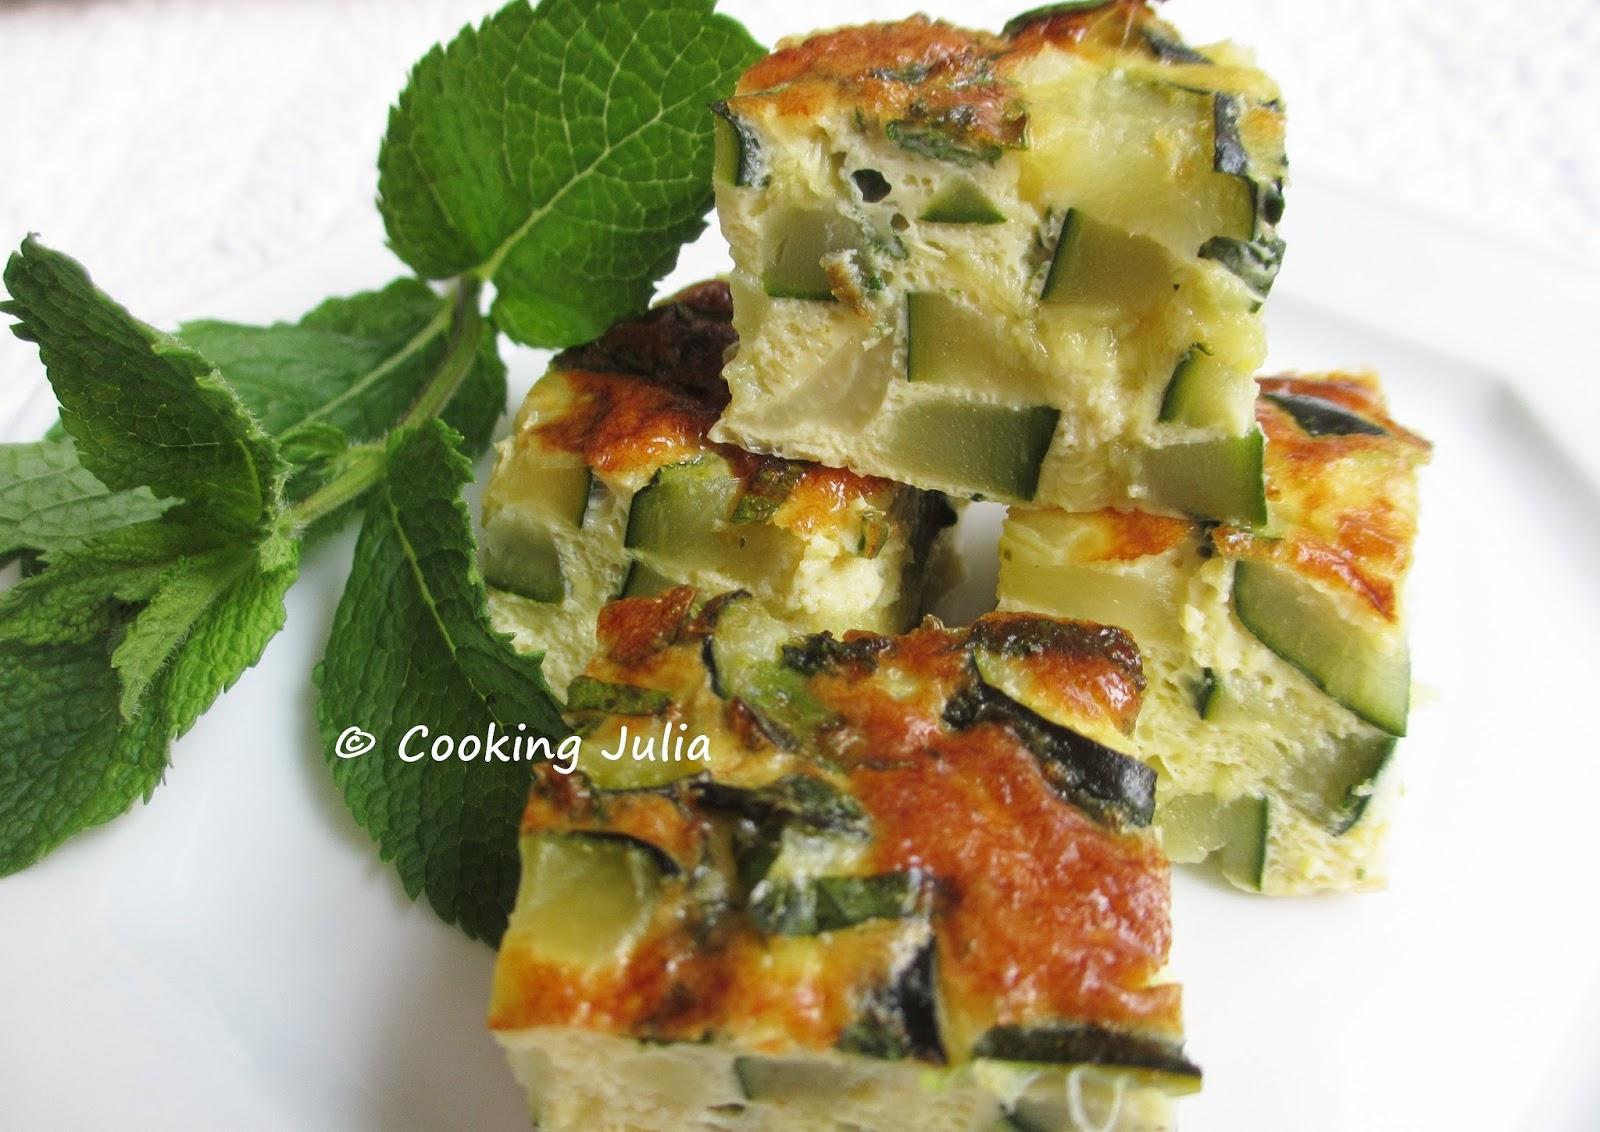 Cooking julia menu de saison 8 septembre en cuisine - Cuisine de saison septembre ...